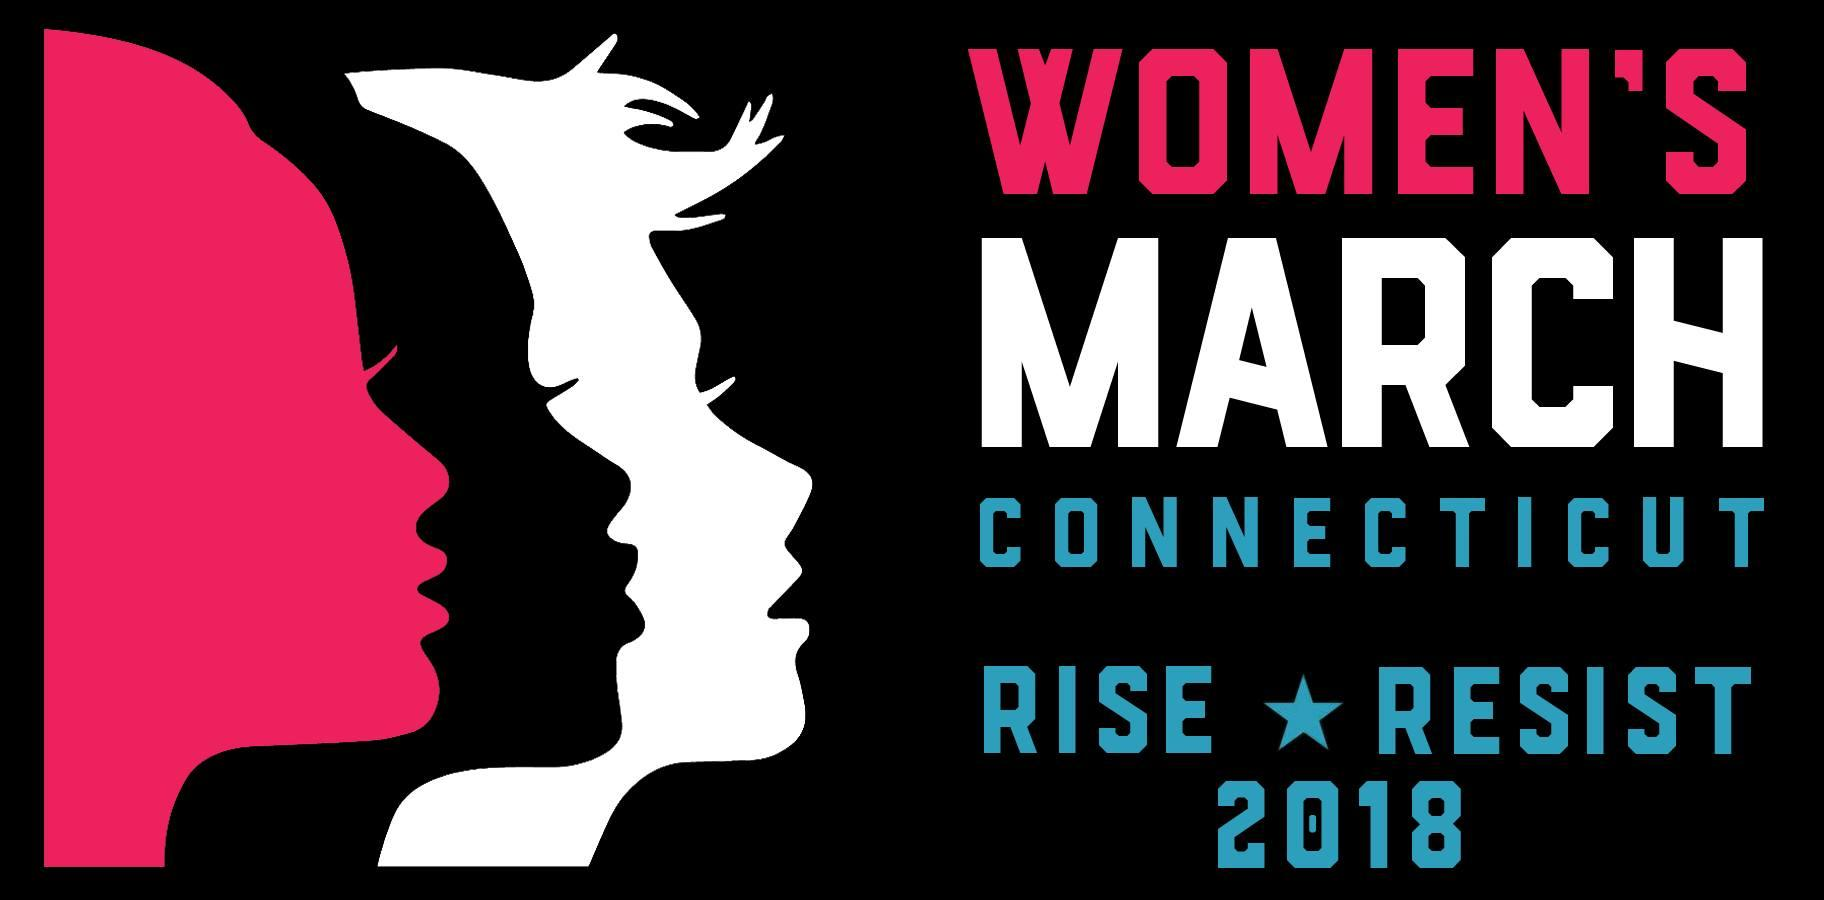 2018 CT Women's March - NCBW Bus